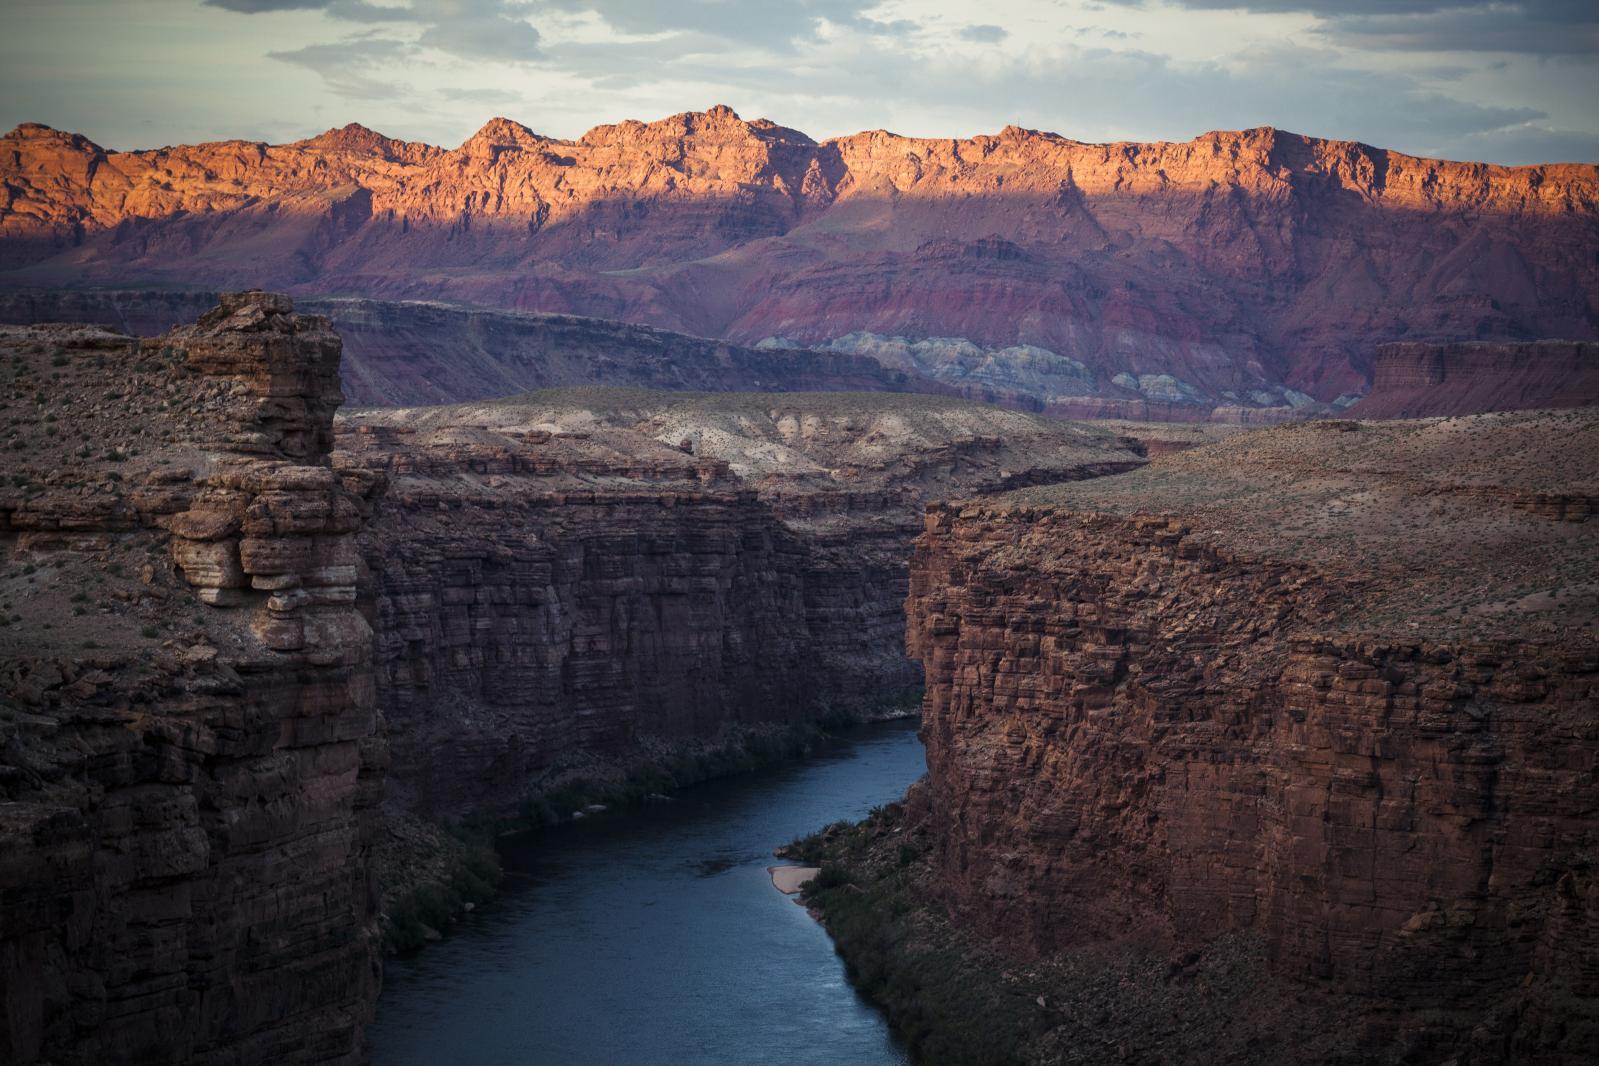 Franck Vogel (né en 1977), LeColorado, 2015, Marble Canyon, Arizona, États-Unis, 80x120cm.